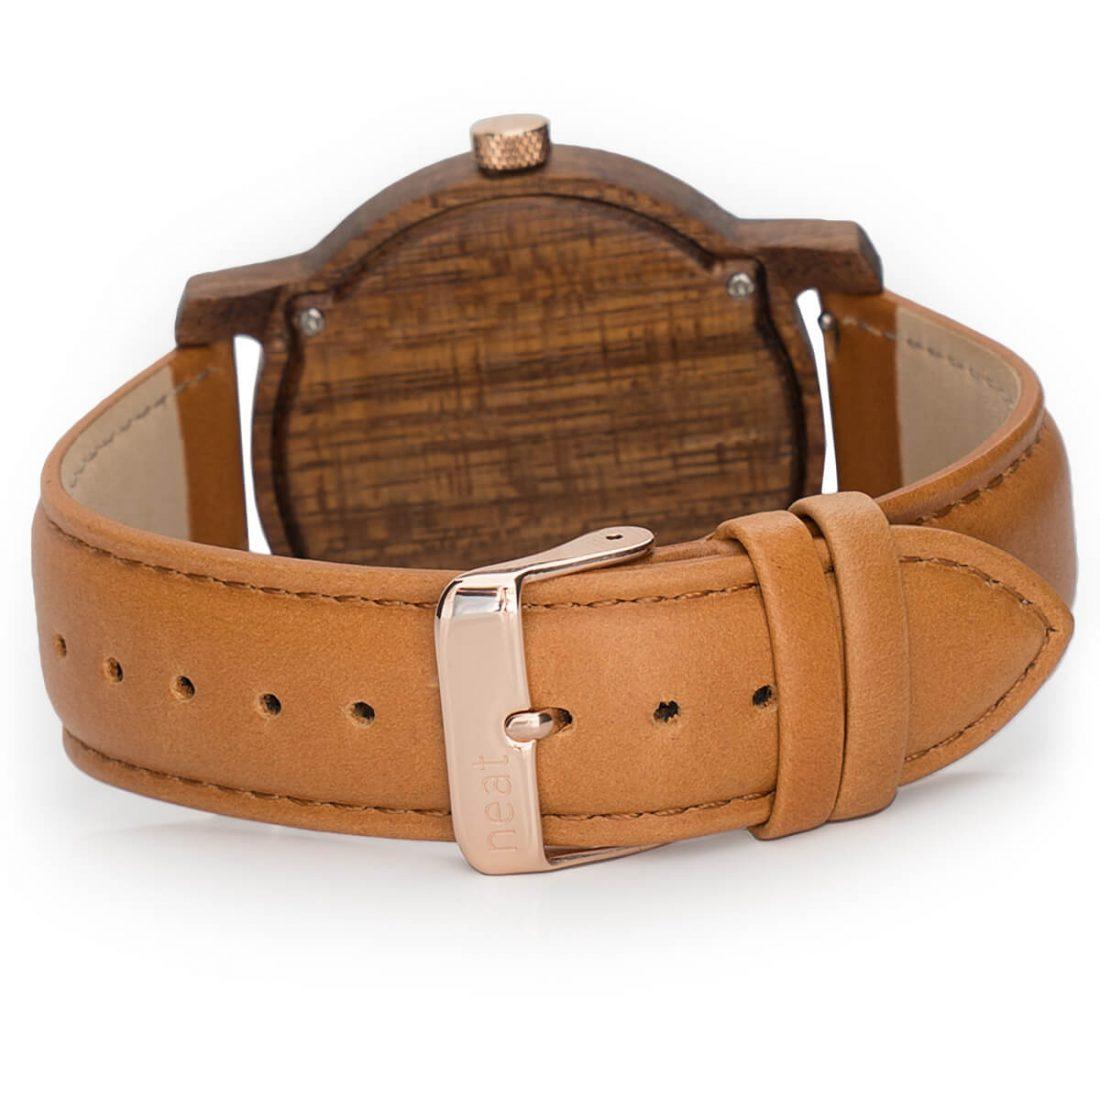 Pánske drevené hodinky Knight - Hnedo modré